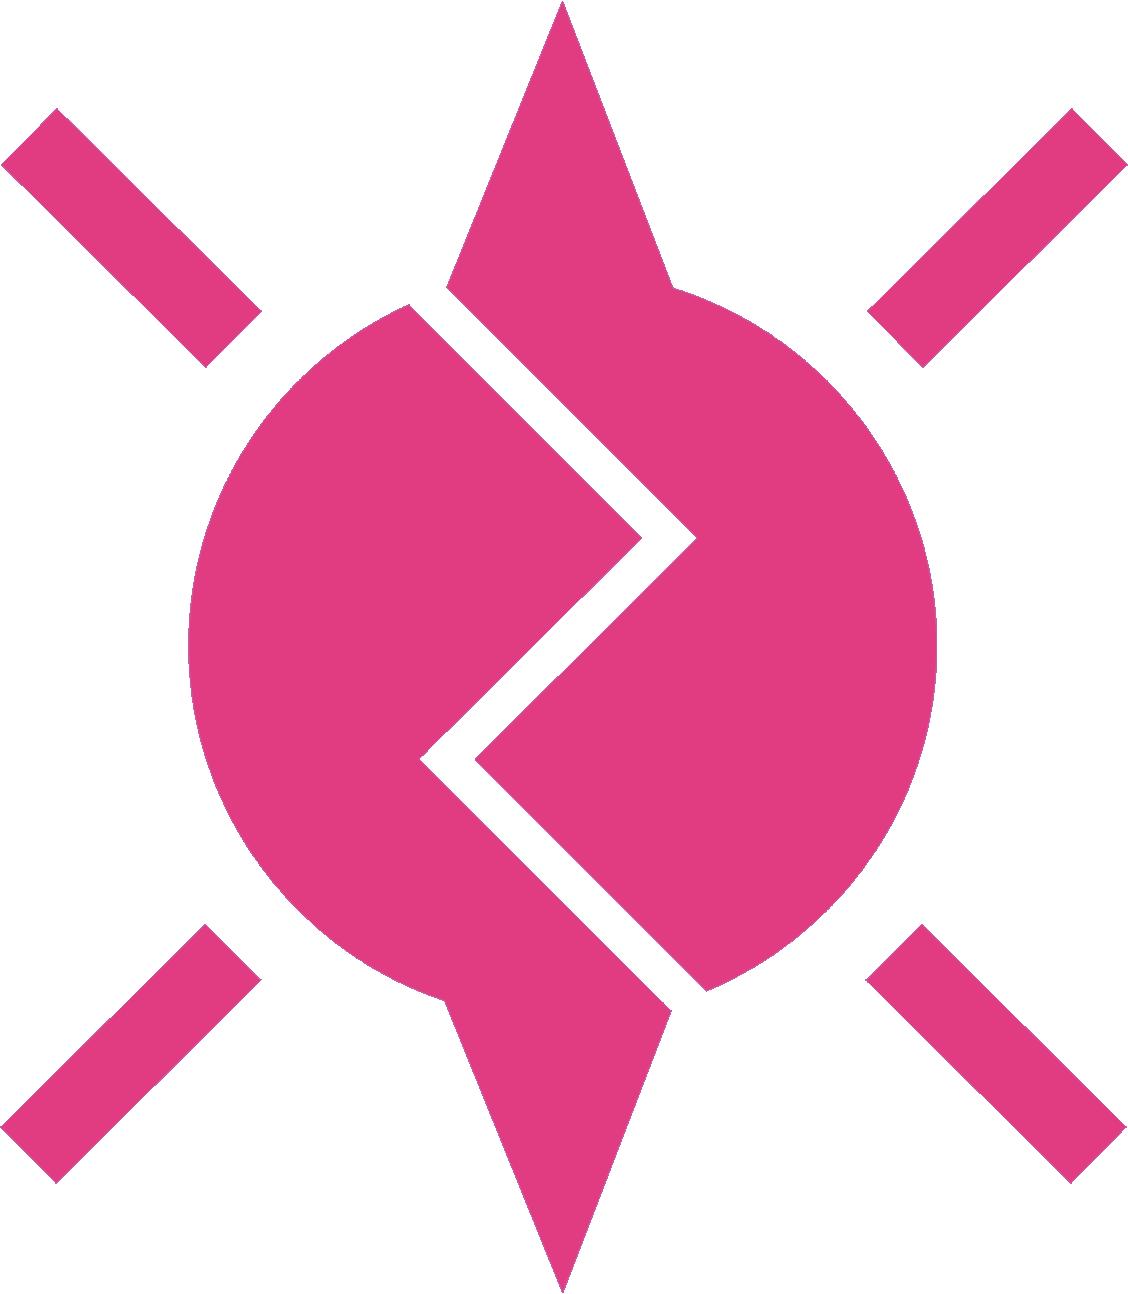 Metroid - Samus Aran Hand Symbol by HyuugaMhil